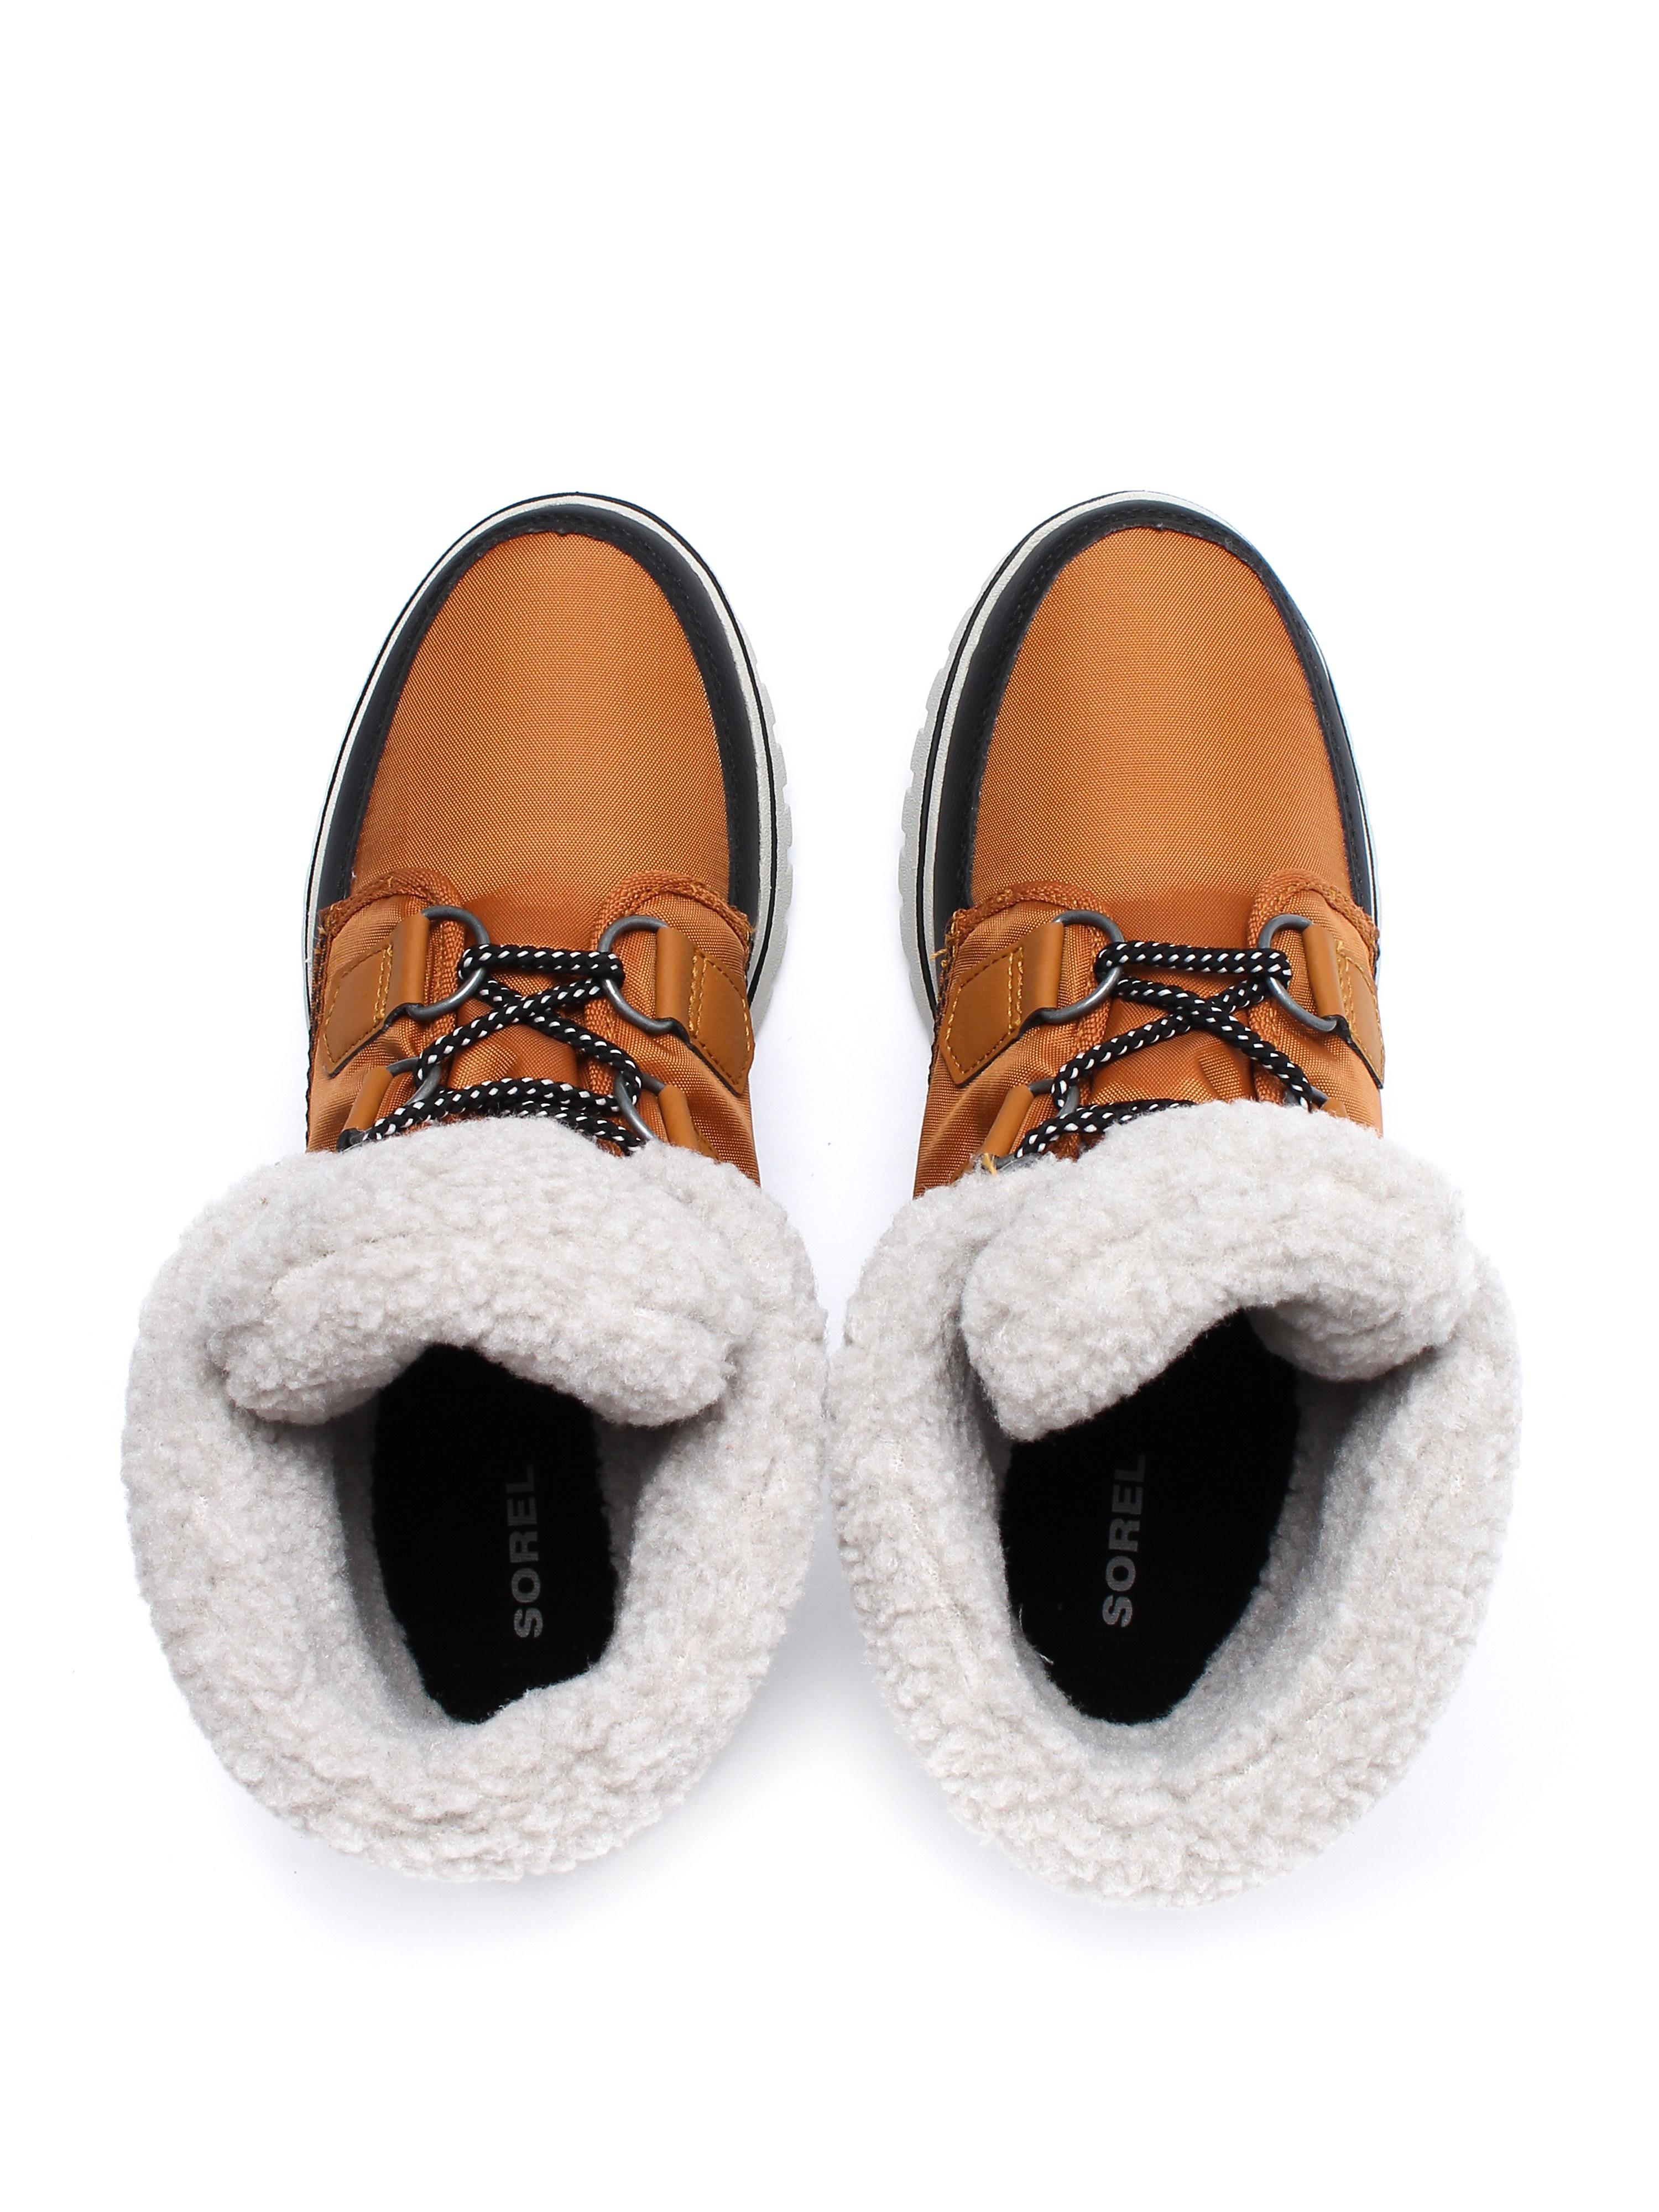 Sorel Women's Cozy Carnival Boots - Caramel